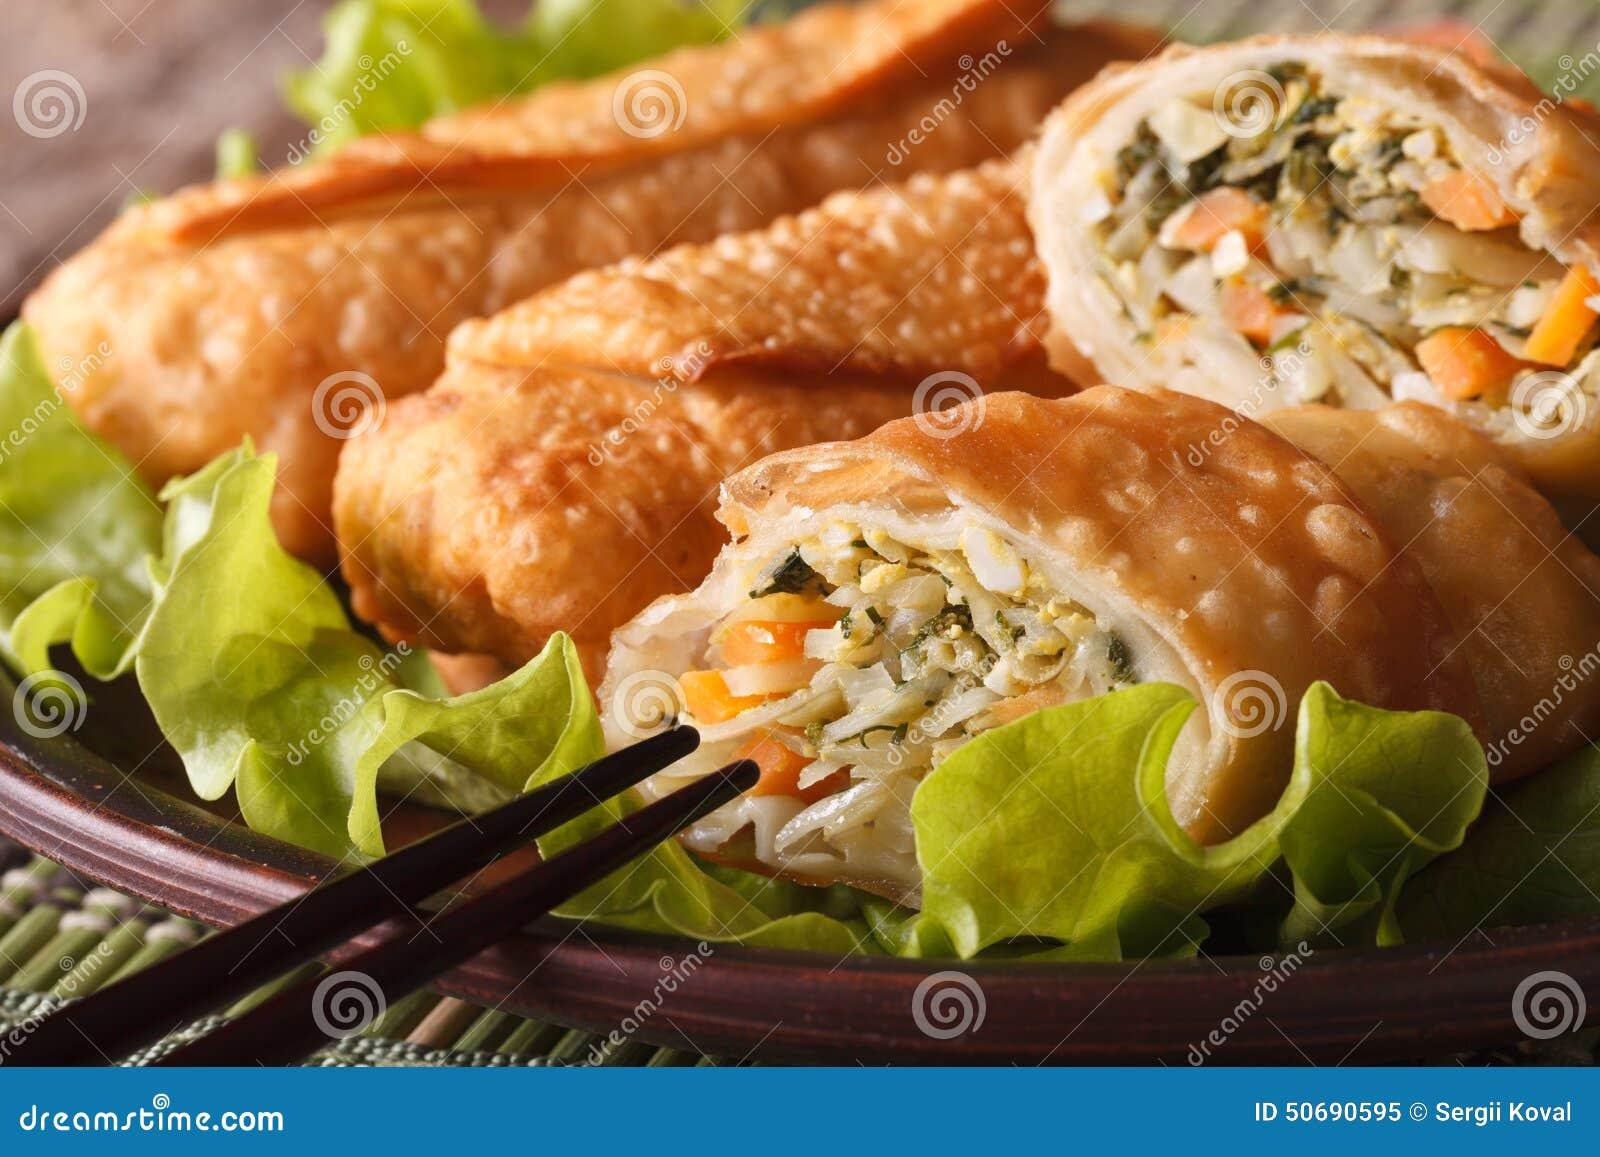 Download 亚洲人油煎了在板材宏指令切的春卷,水平 库存图片. 图片 包括有 没人, 部分, 膳食, 昏暗, 快餐, 聚会所 - 50690595